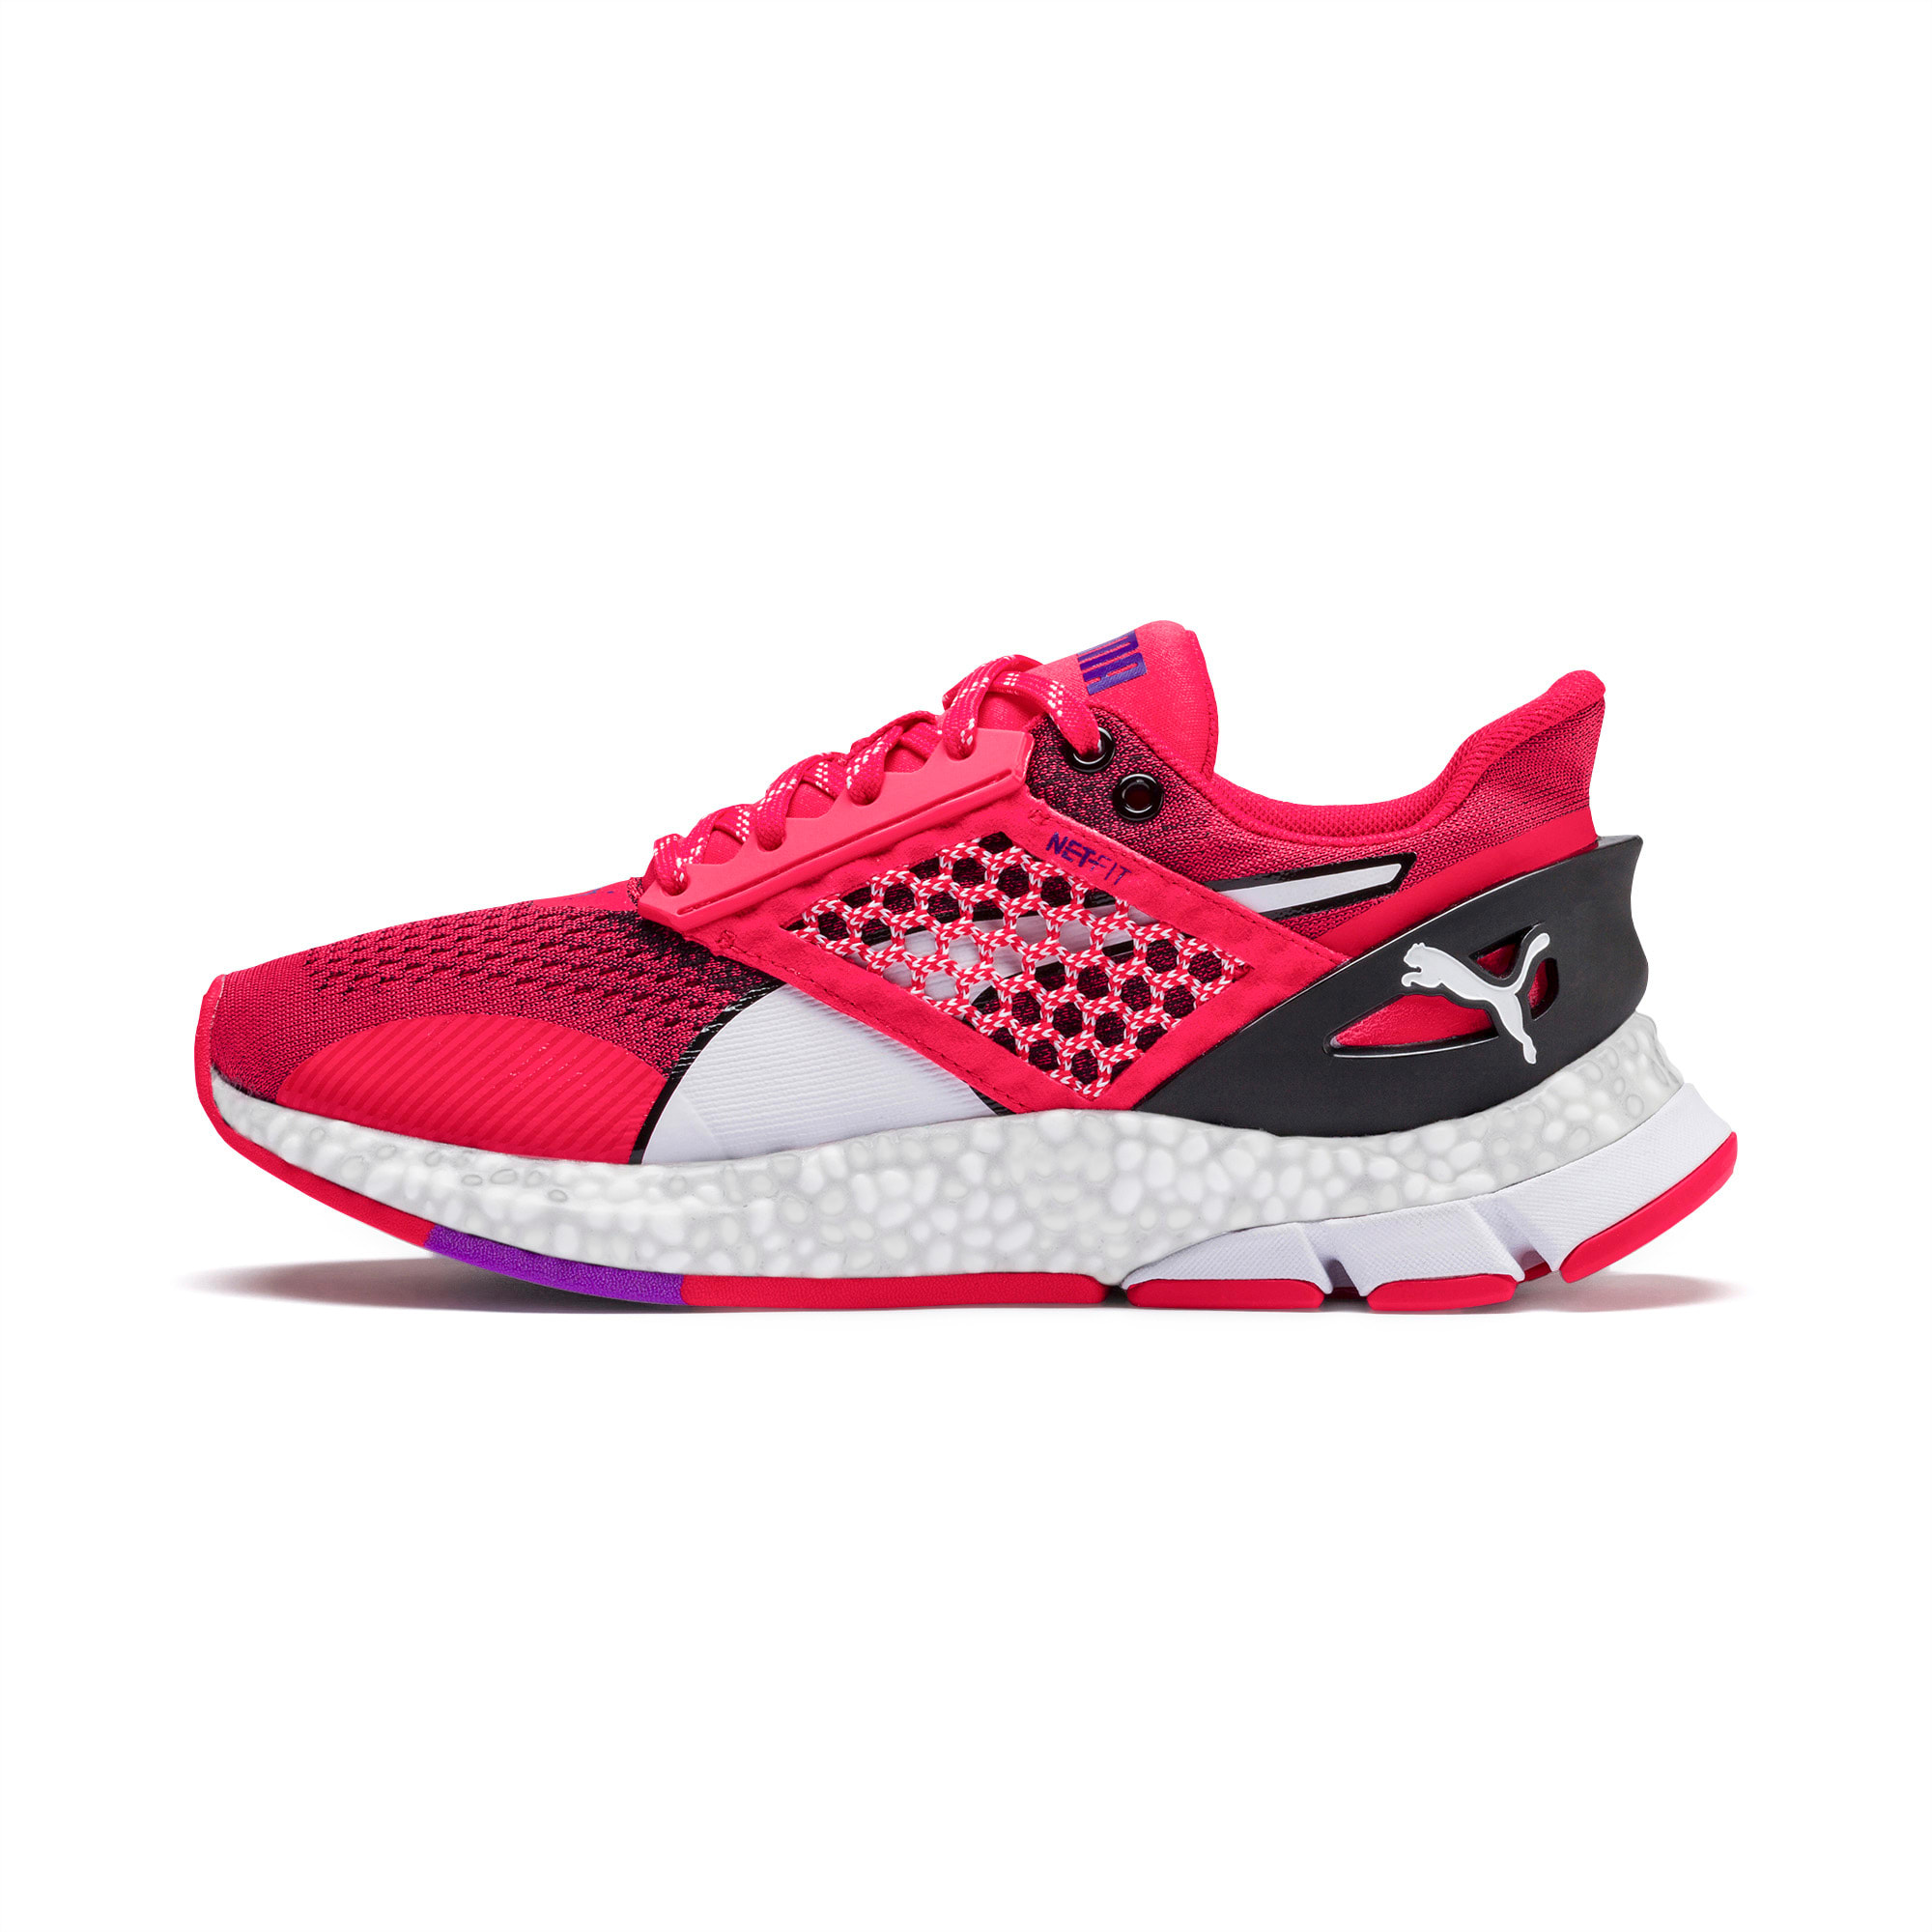 HYBRID NETFIT Astro Women's Running Shoes